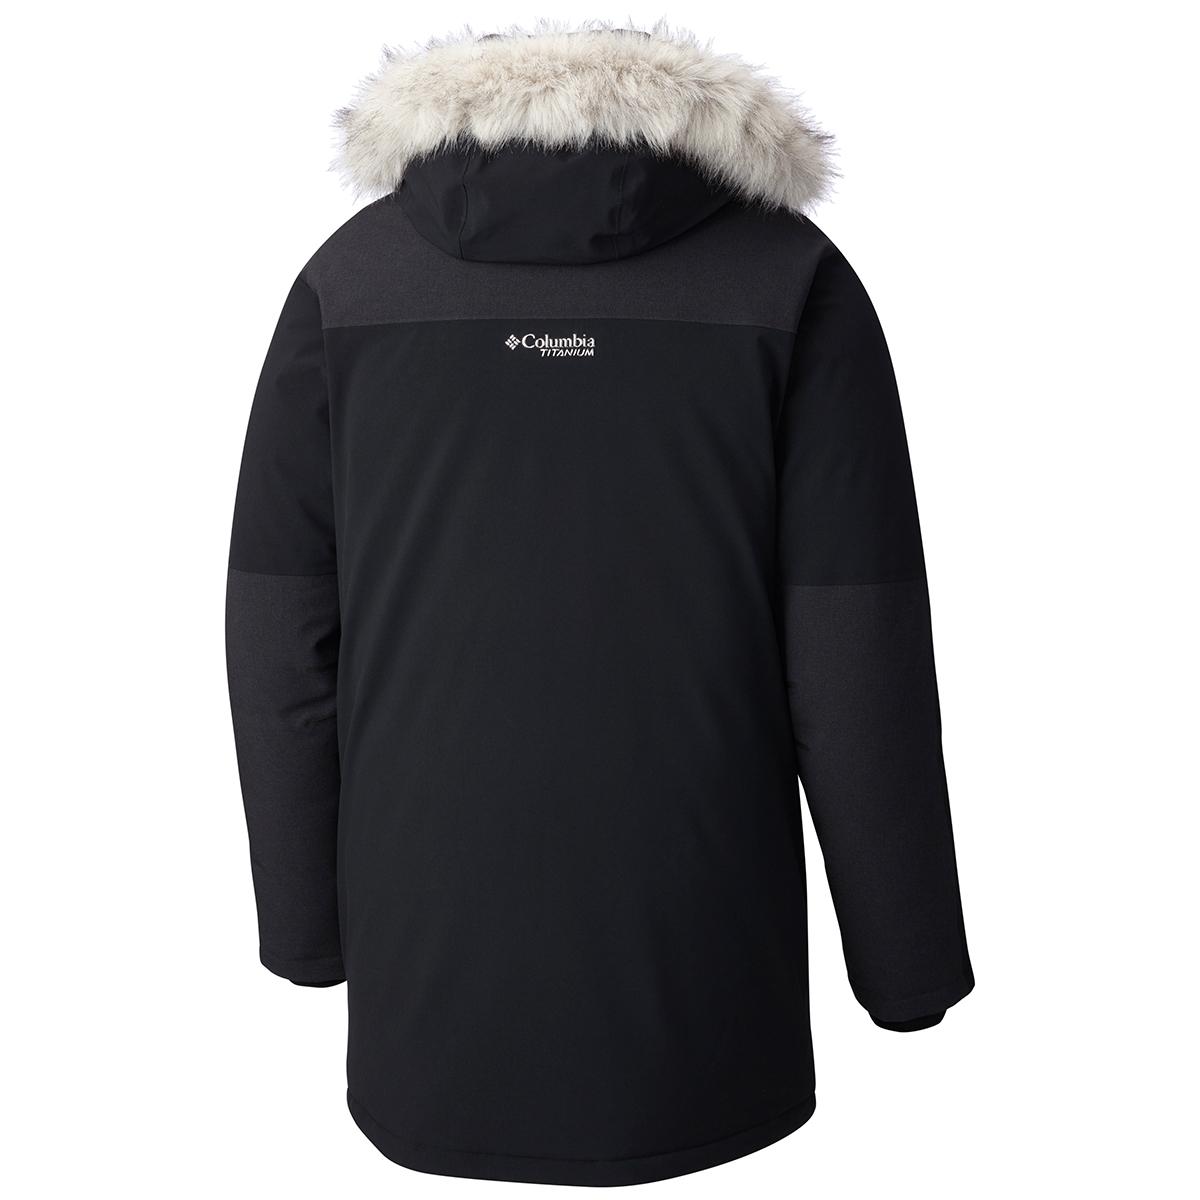 Columbia-Sportswear-Titan-PAss-Titanium-Down-Jacket-Back